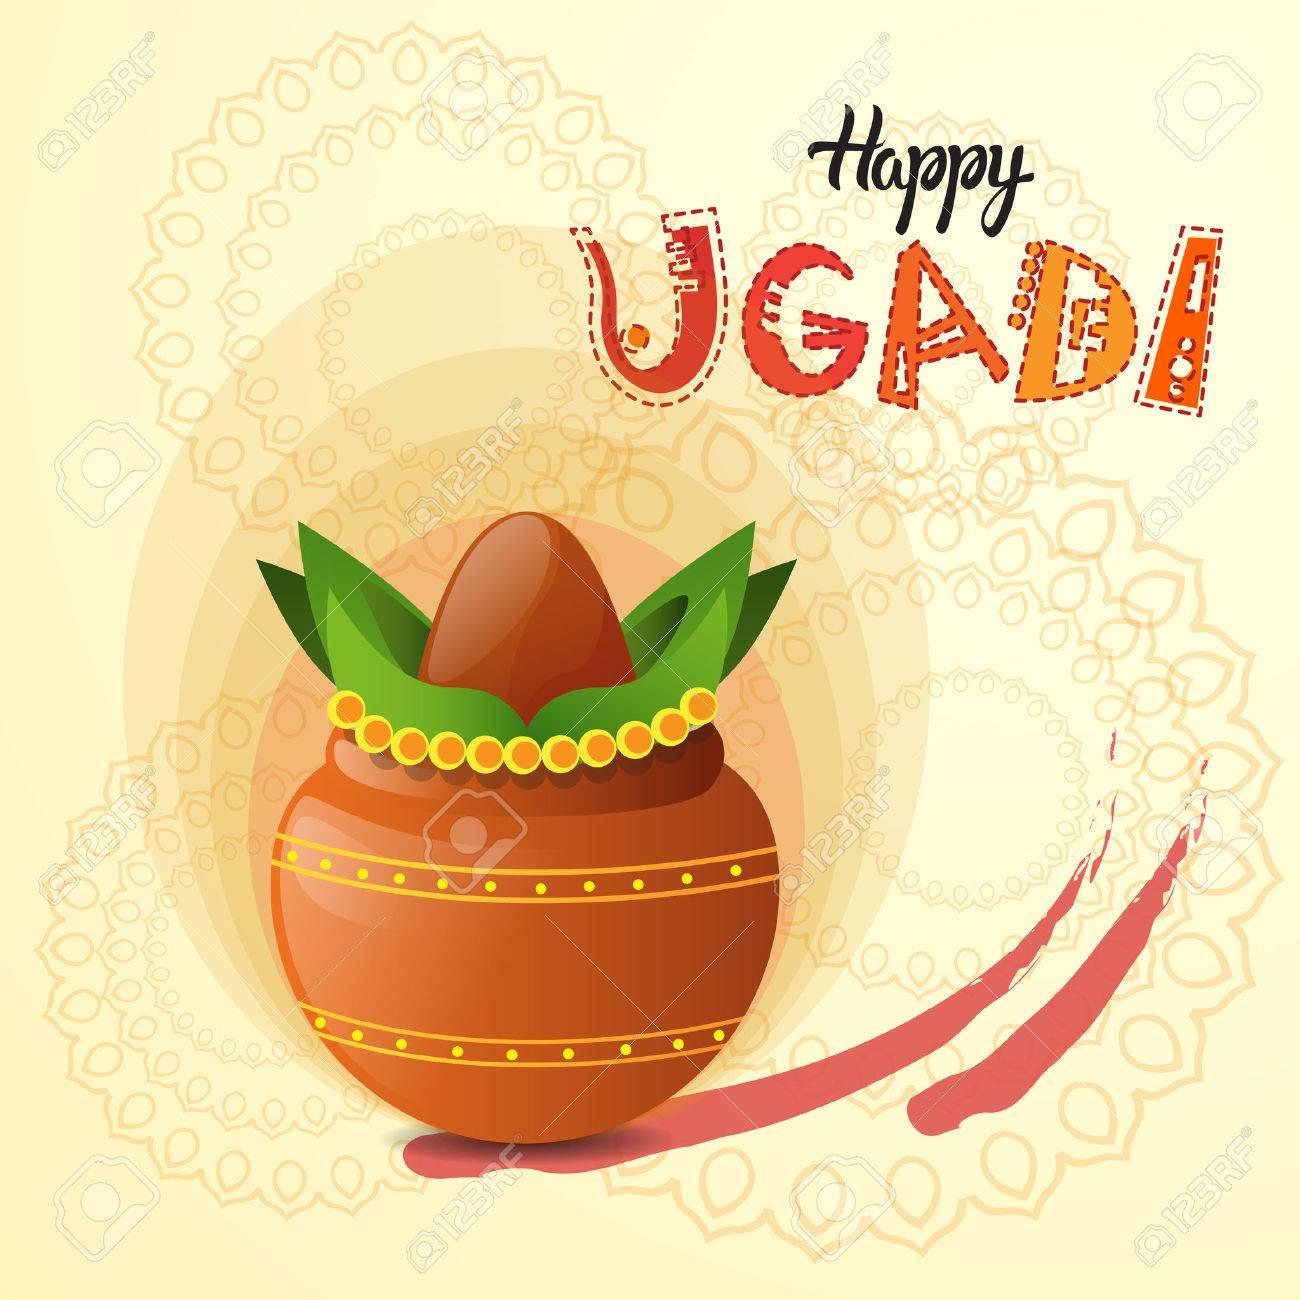 happy ugadi and gudi padwa hindu new year greeting card holiday pot with coconut flat vector